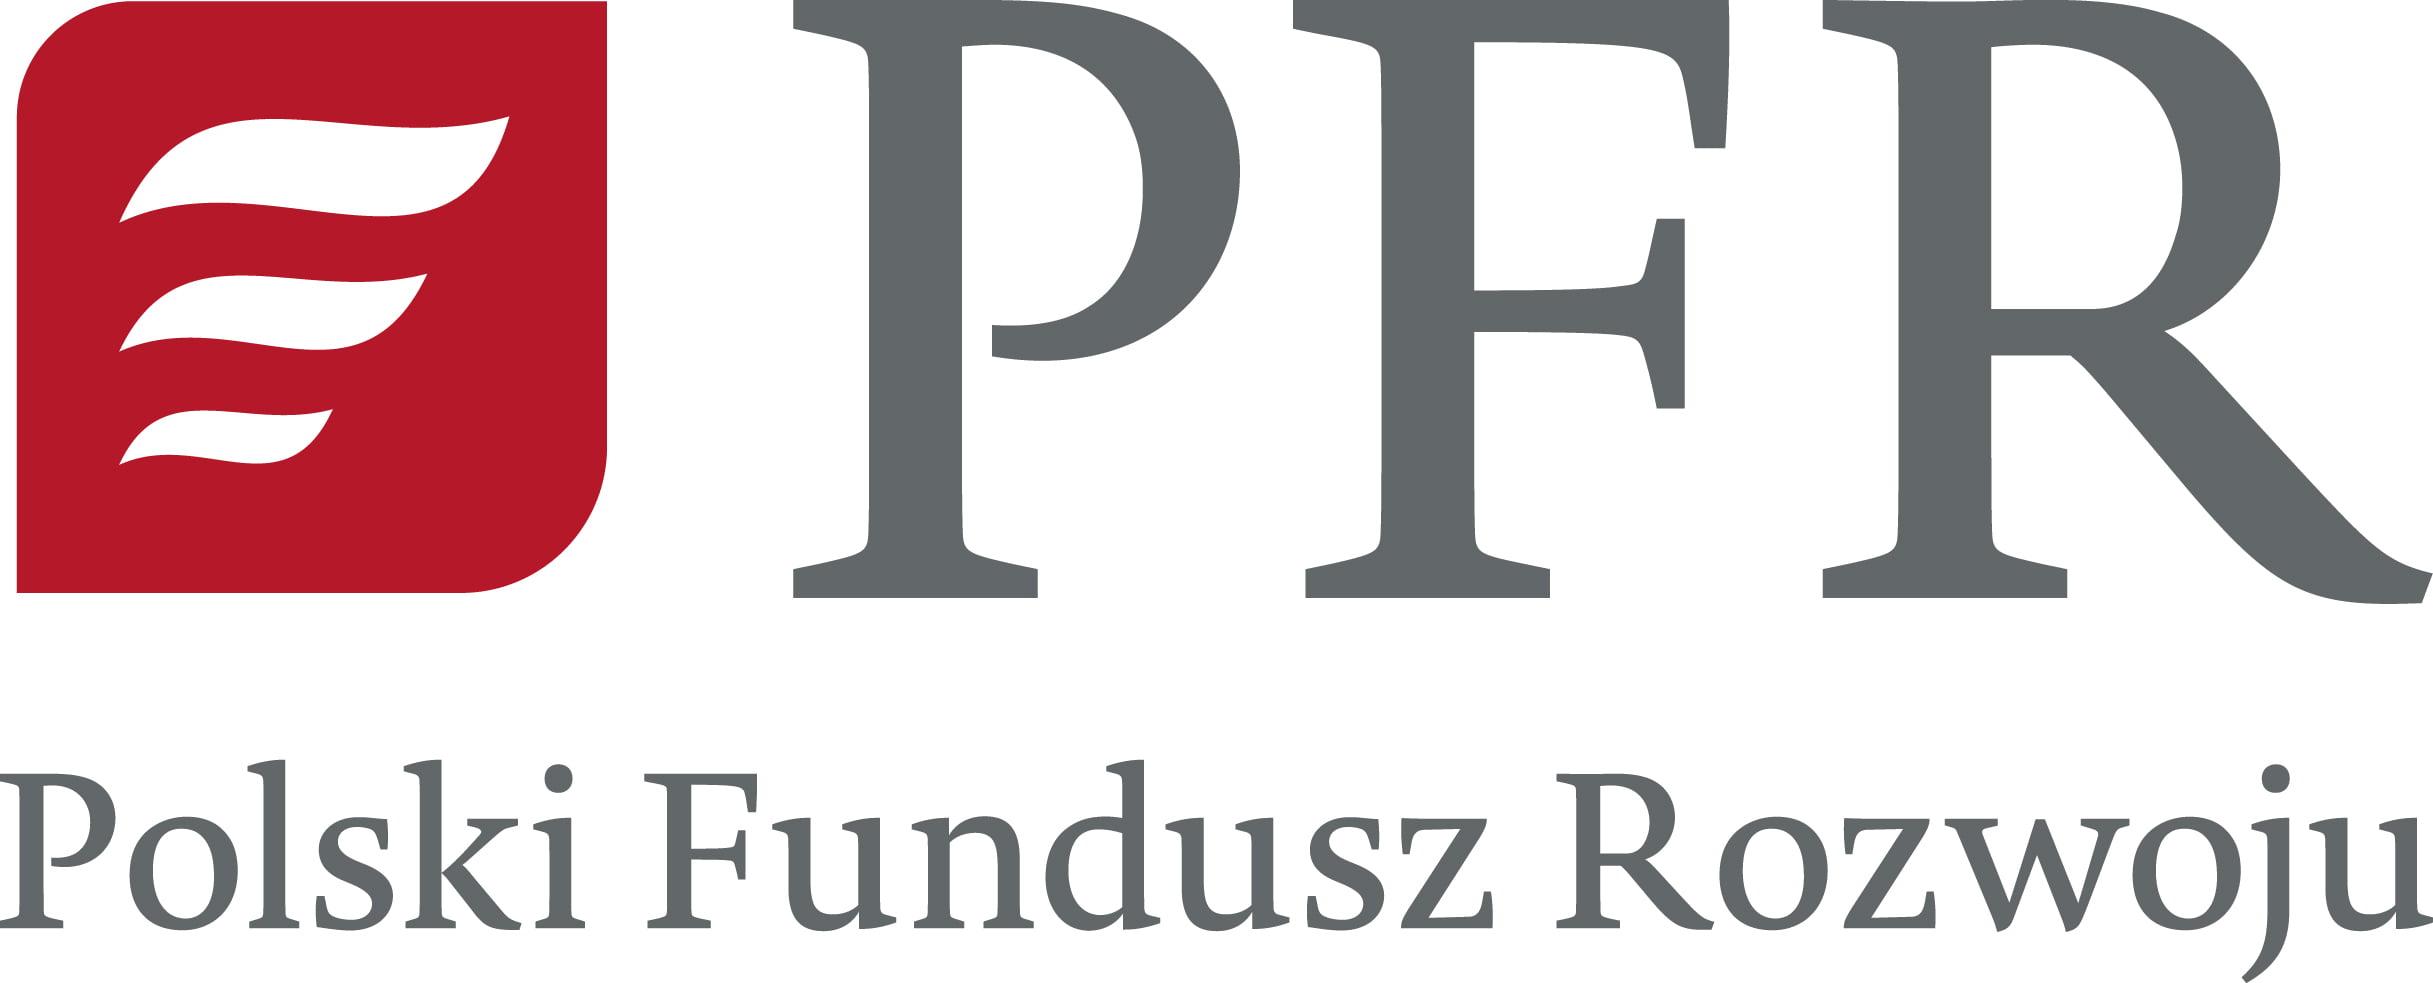 logo PFR S.A.